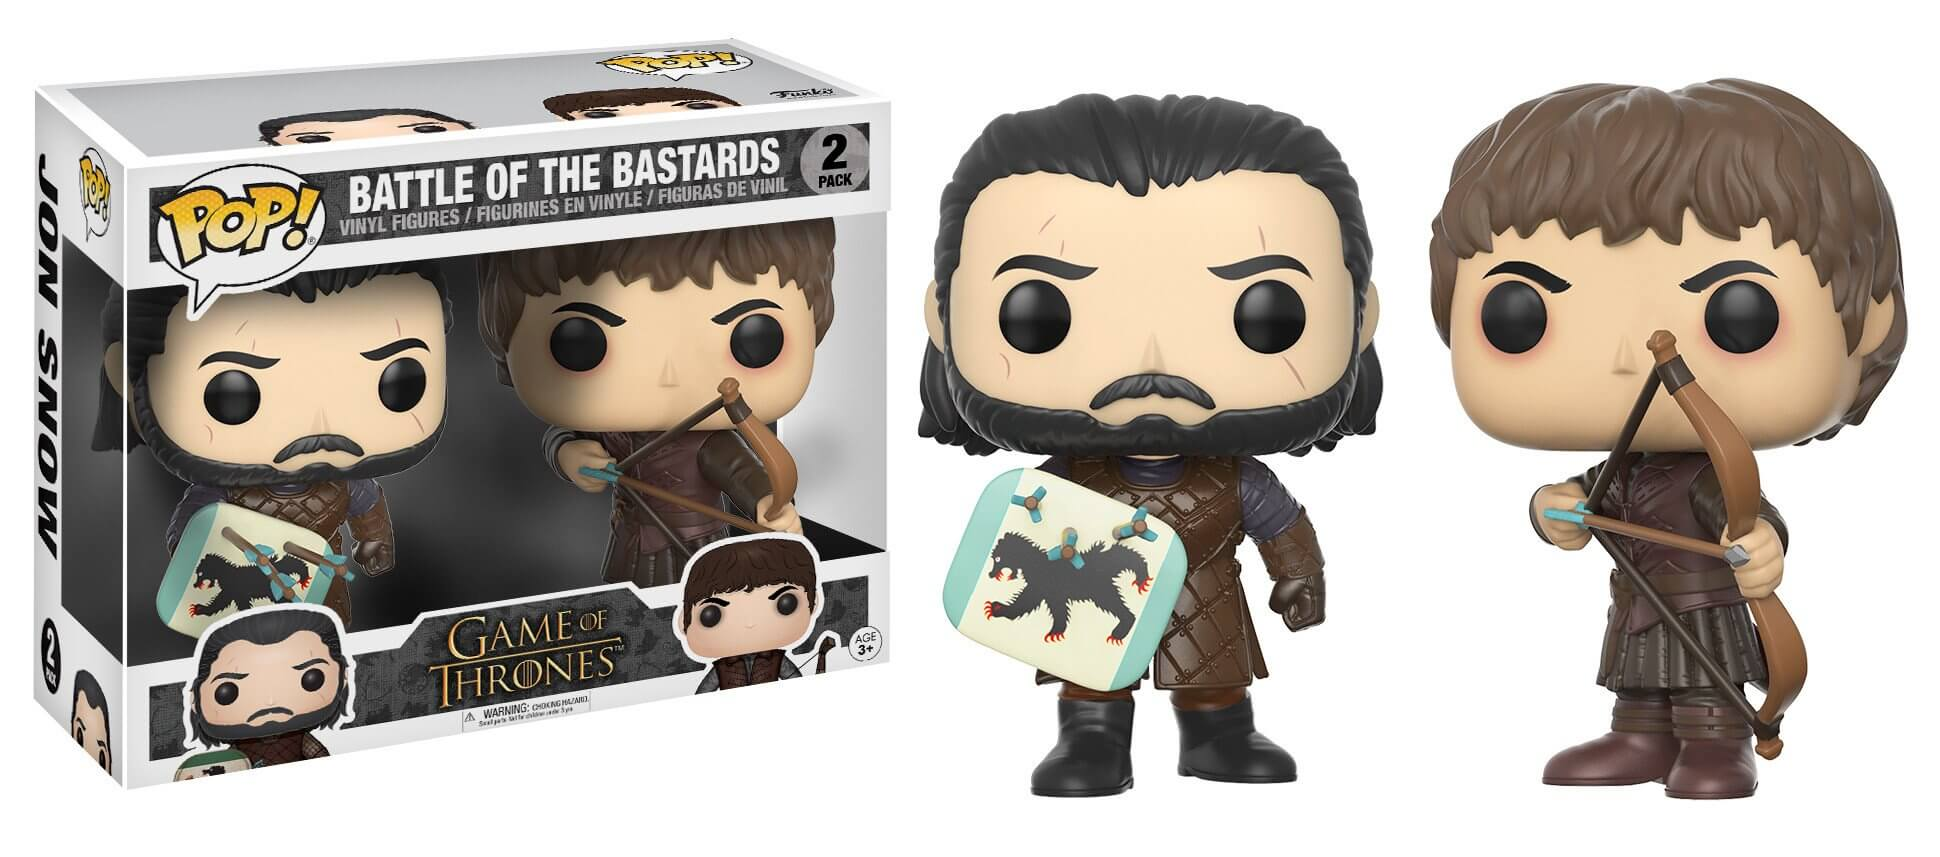 Battle of Bastards ( Batalha dos Bastardos ) - Game of Thrones - Funko Pop!